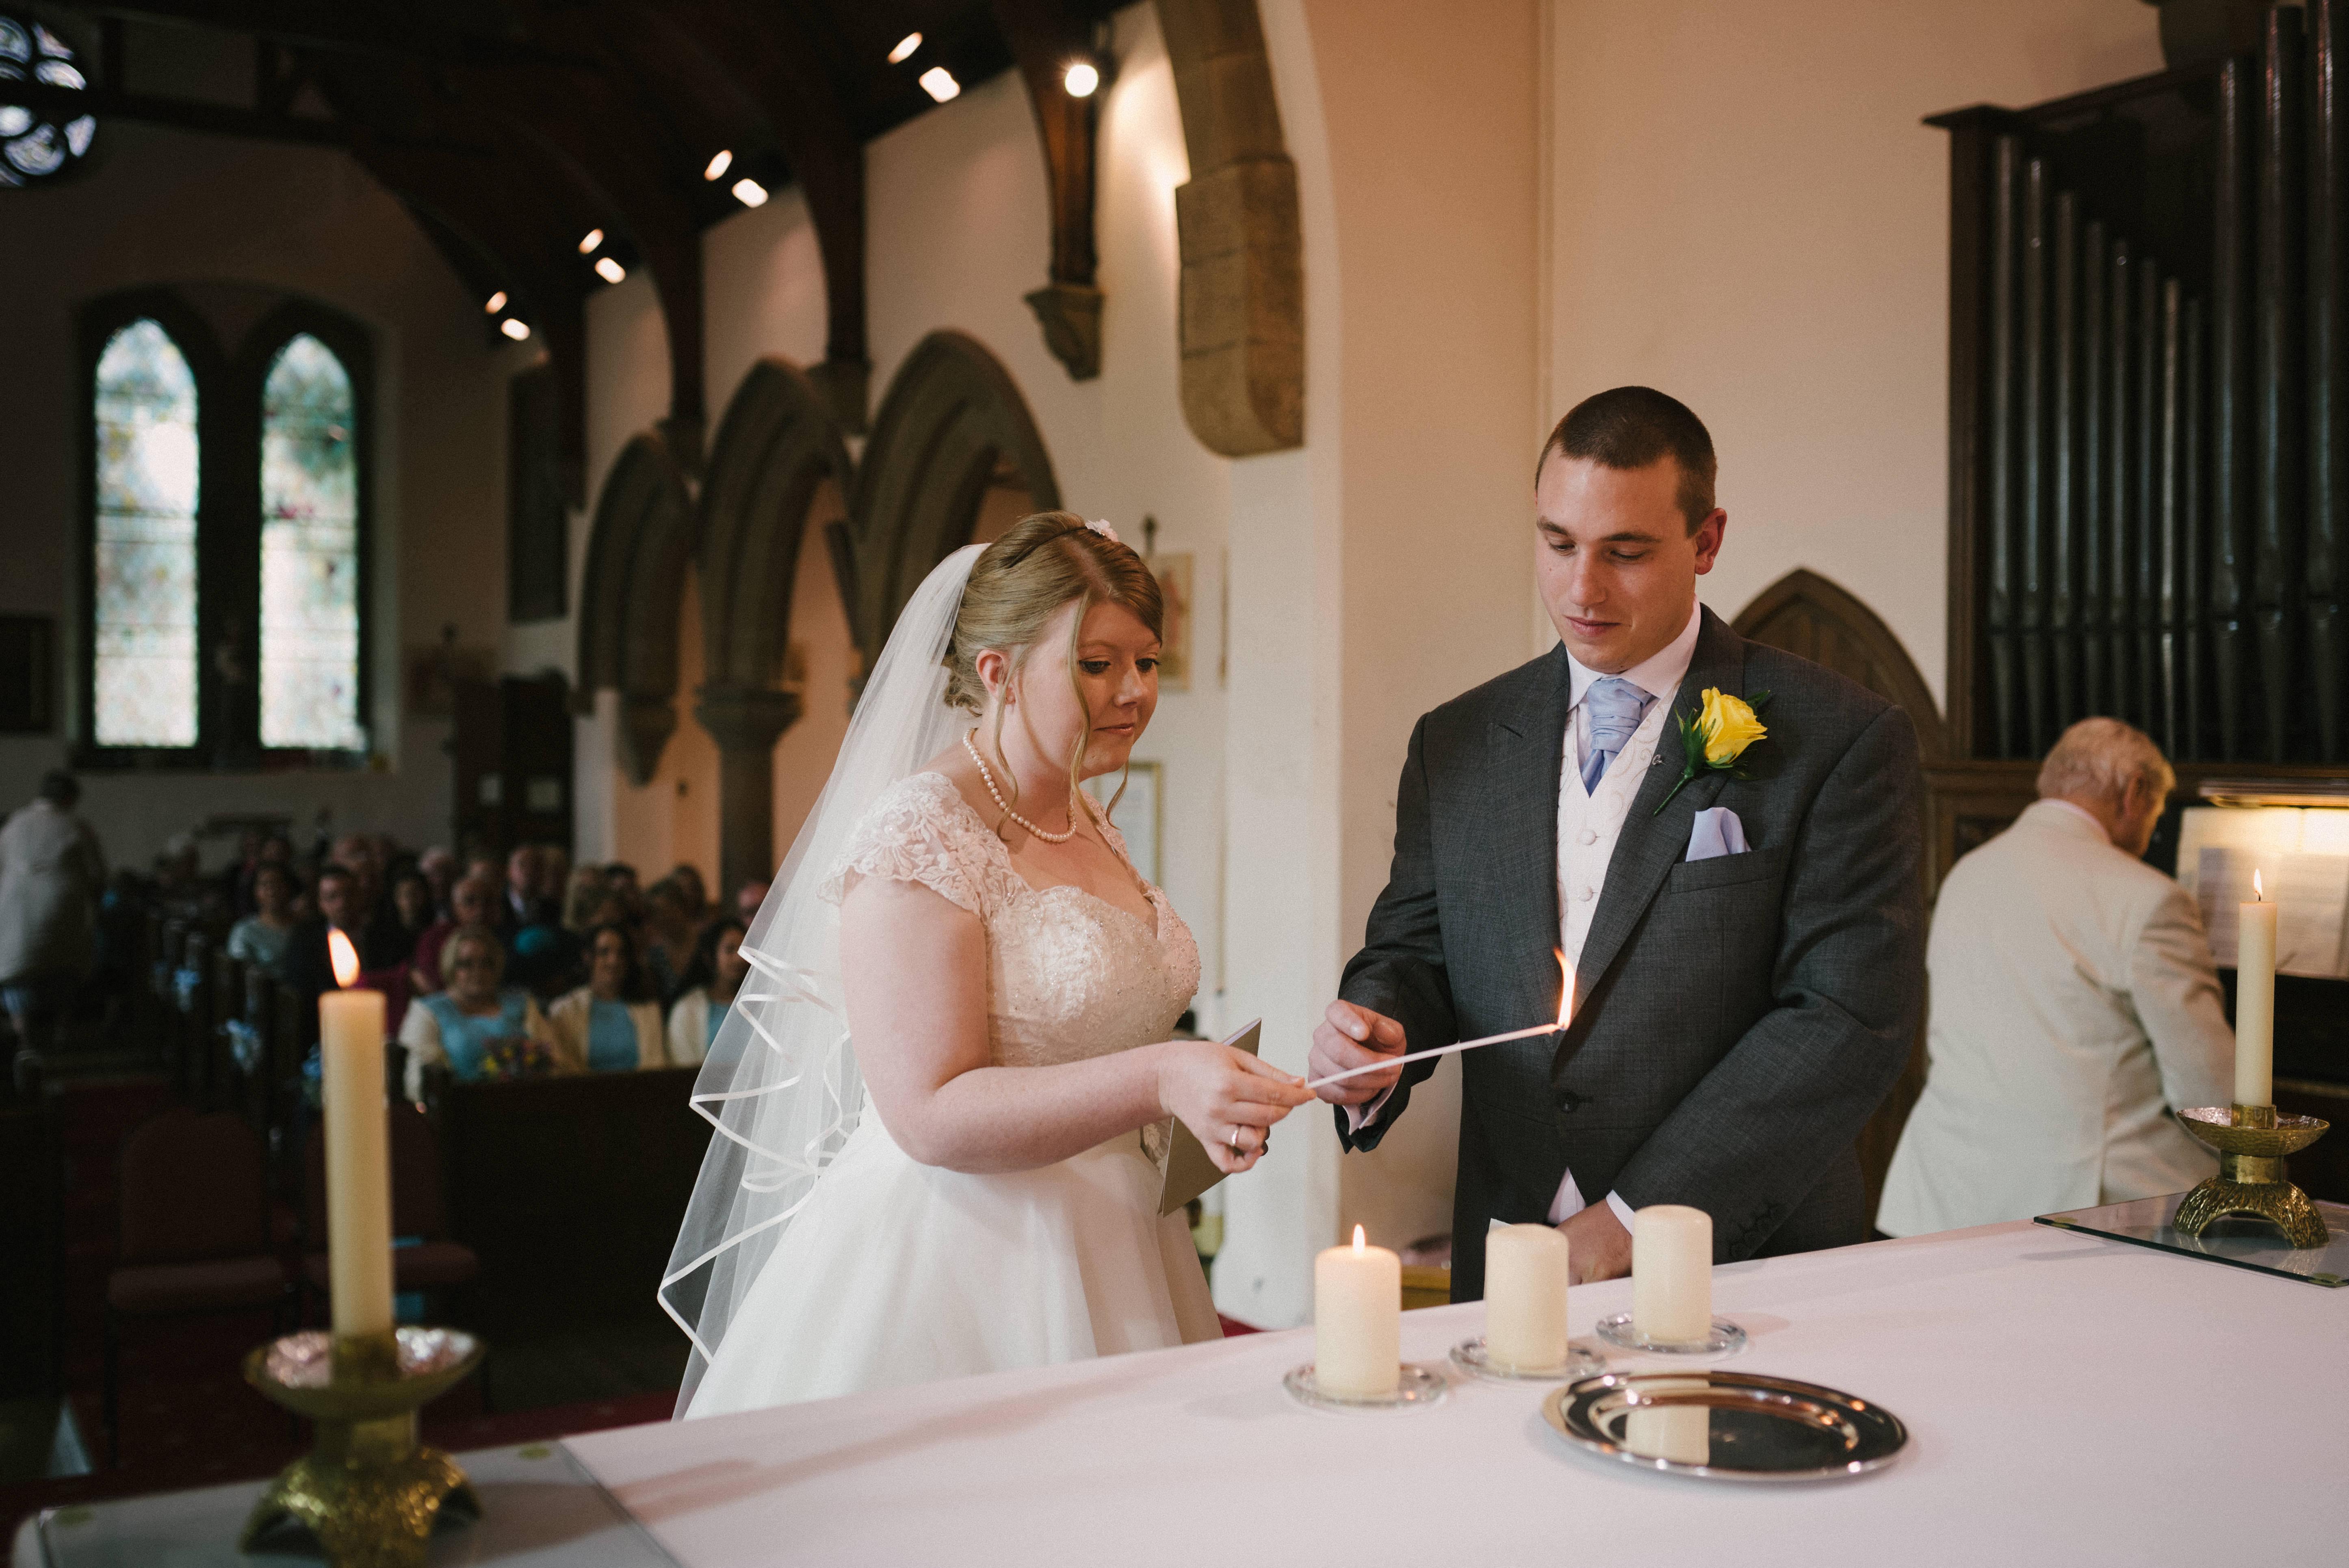 Wedding hannah lewis%205 original